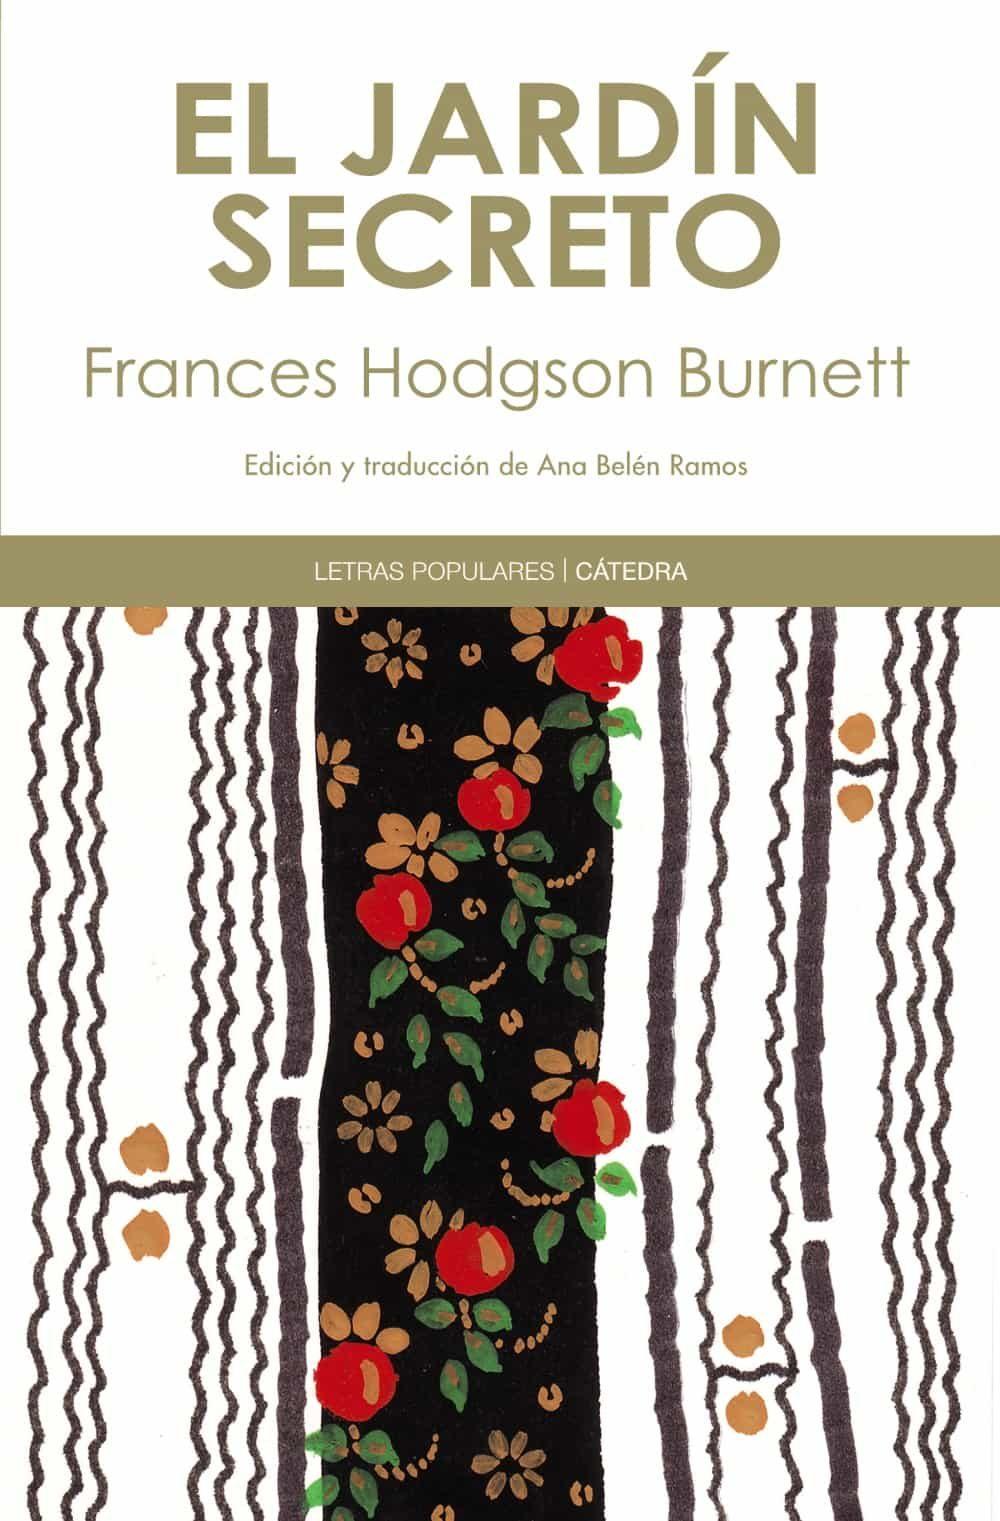 EL JARDIN SECRETO | FRANCES HODGSON BURNETT | Comprar libro ...